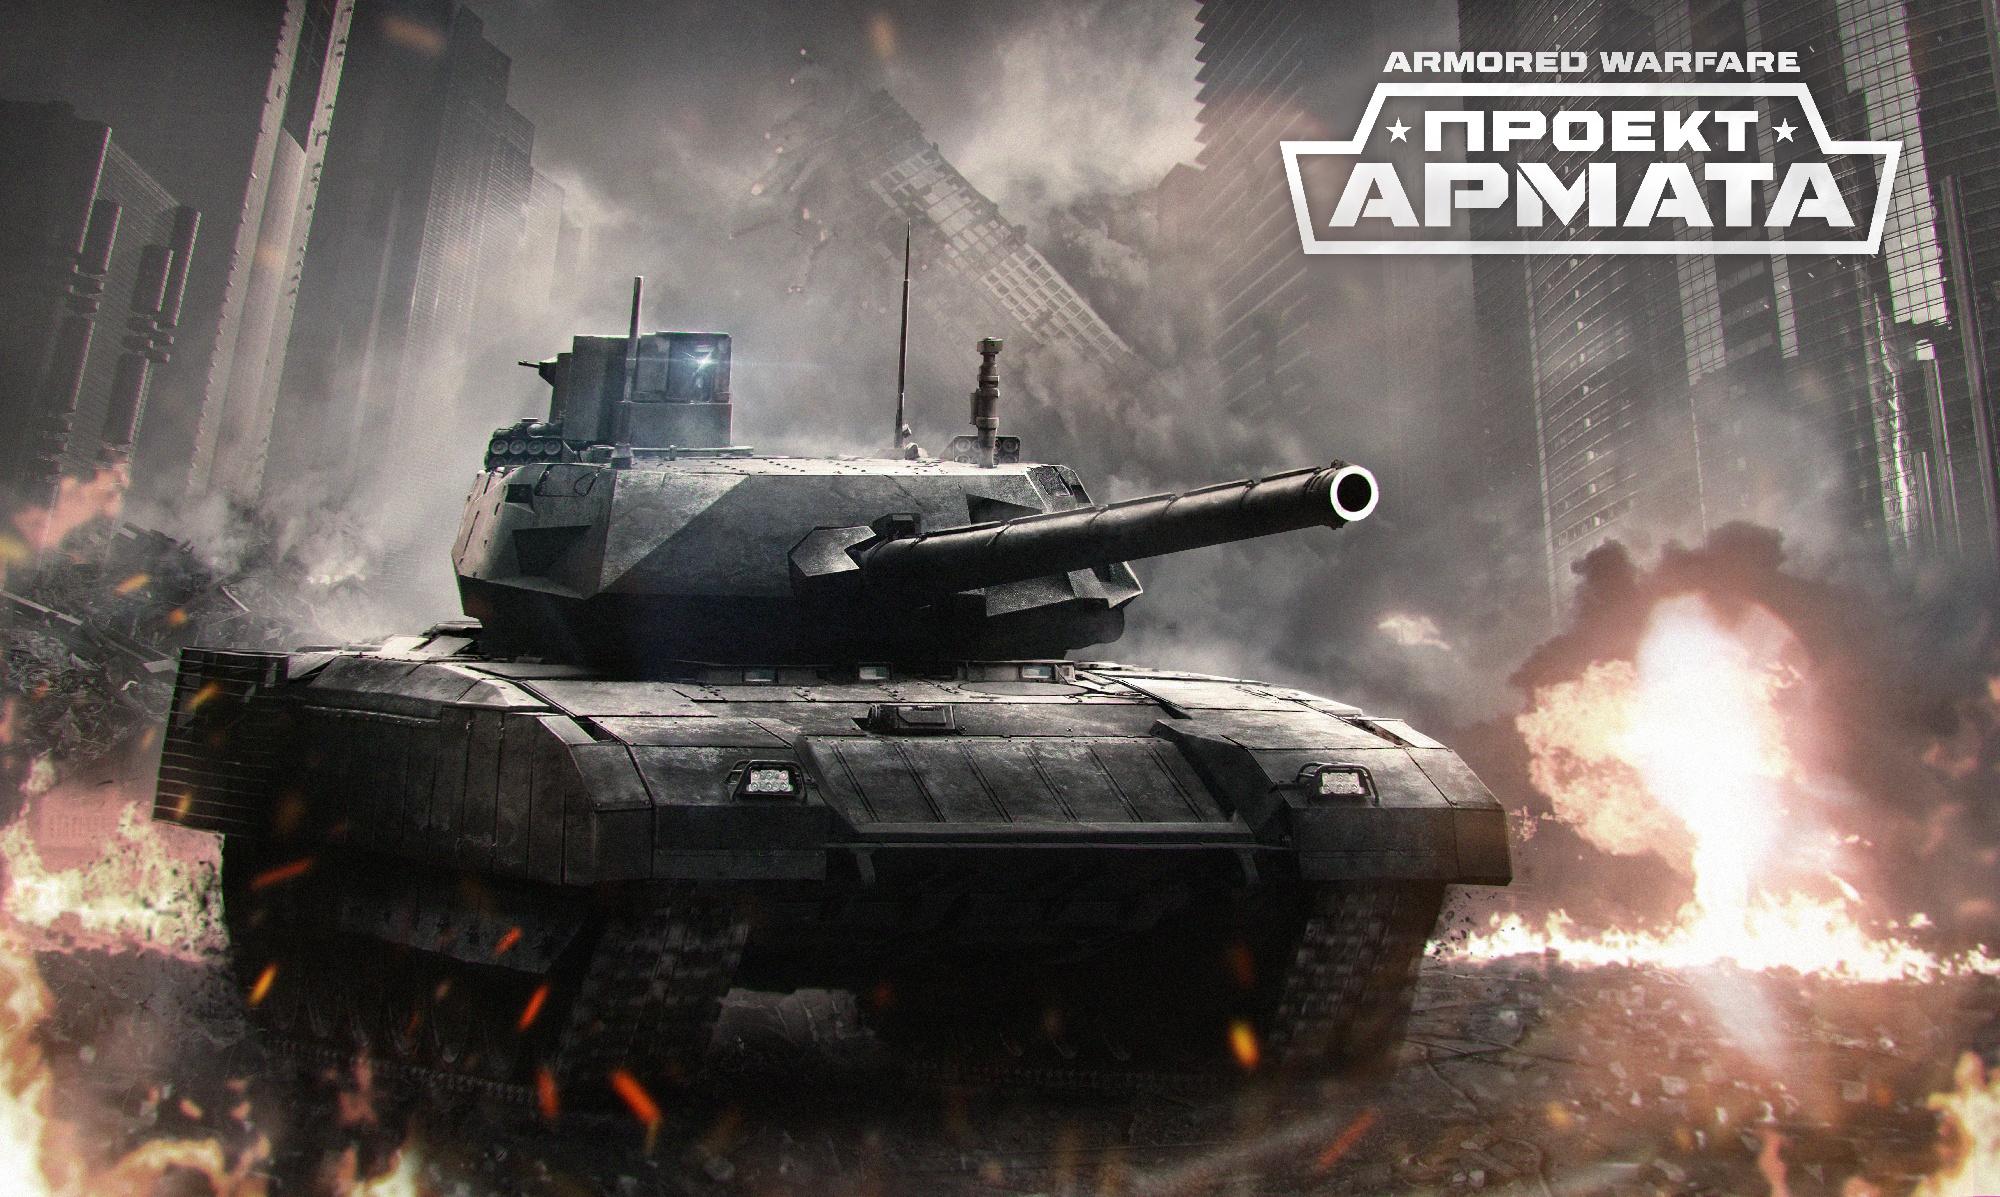 Armored Warfare: Проект Армата скачать